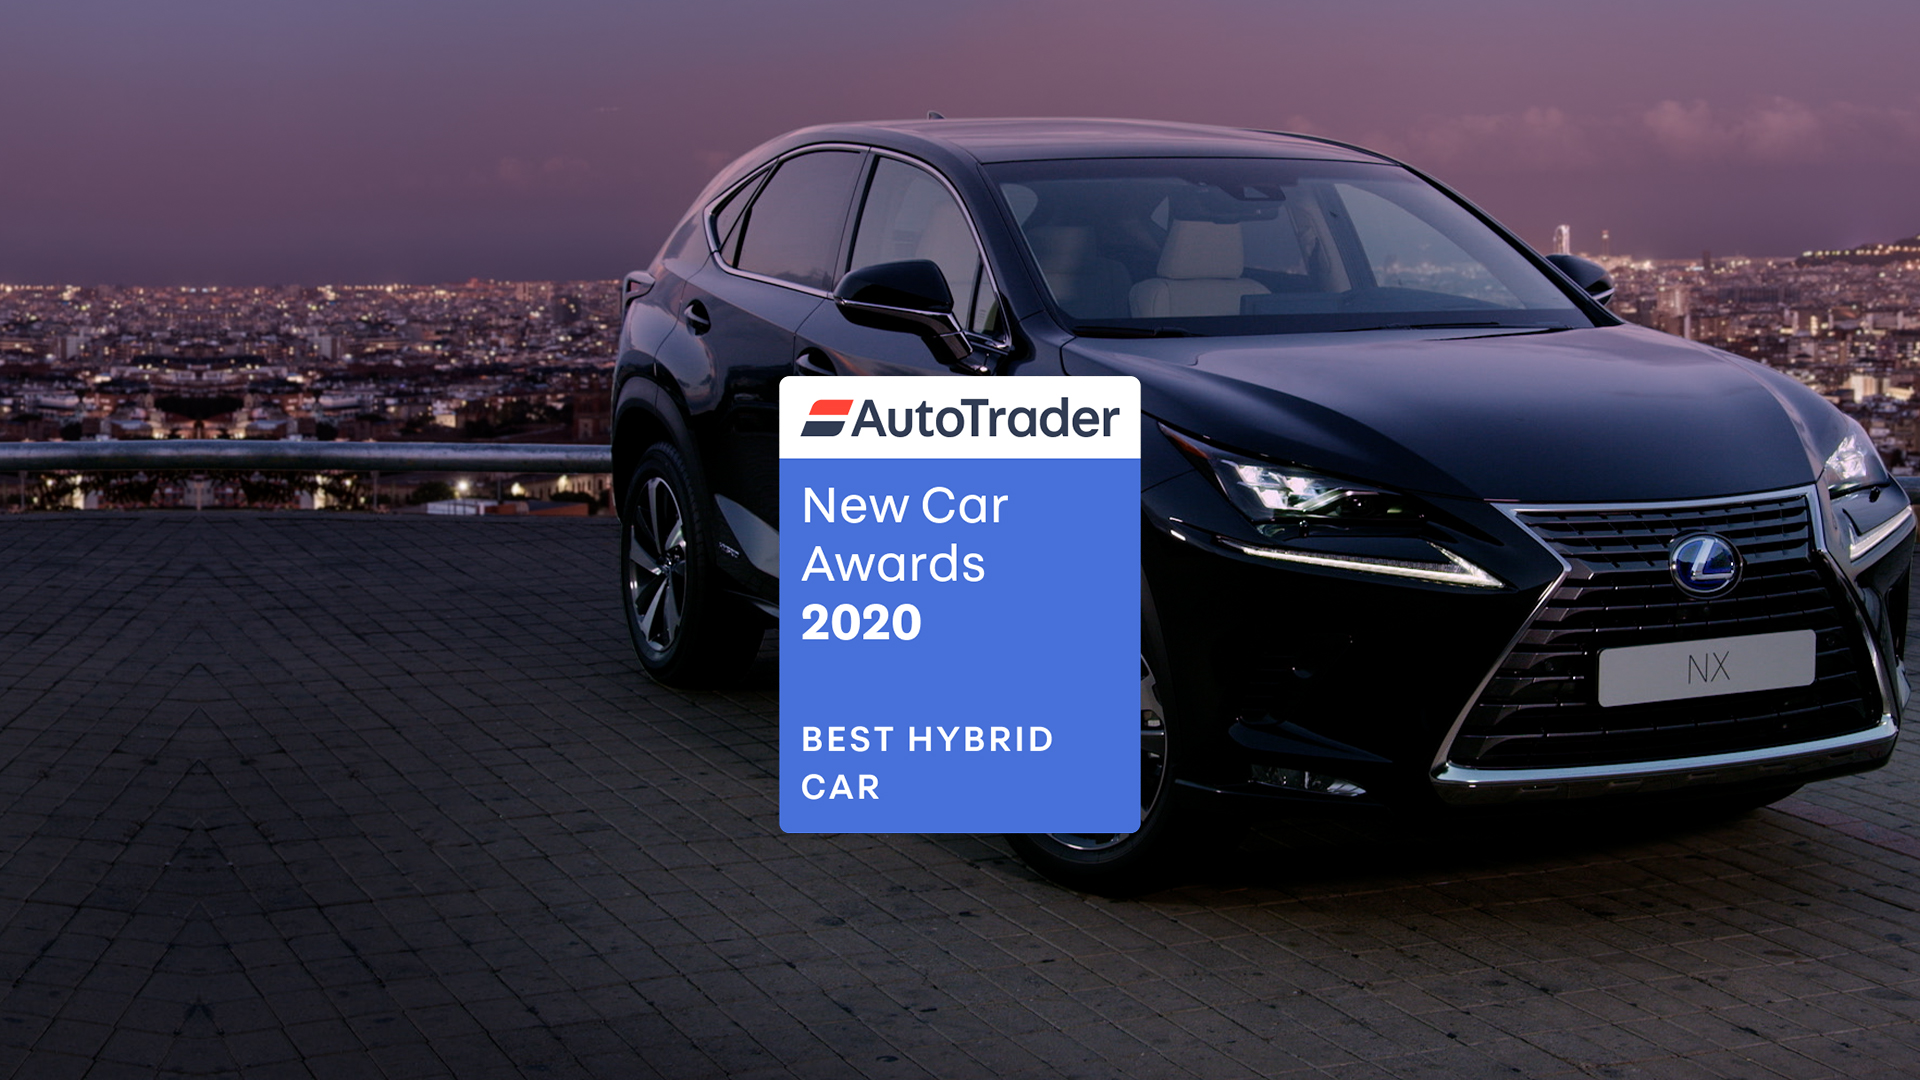 new car awards 2020 best hybrid car